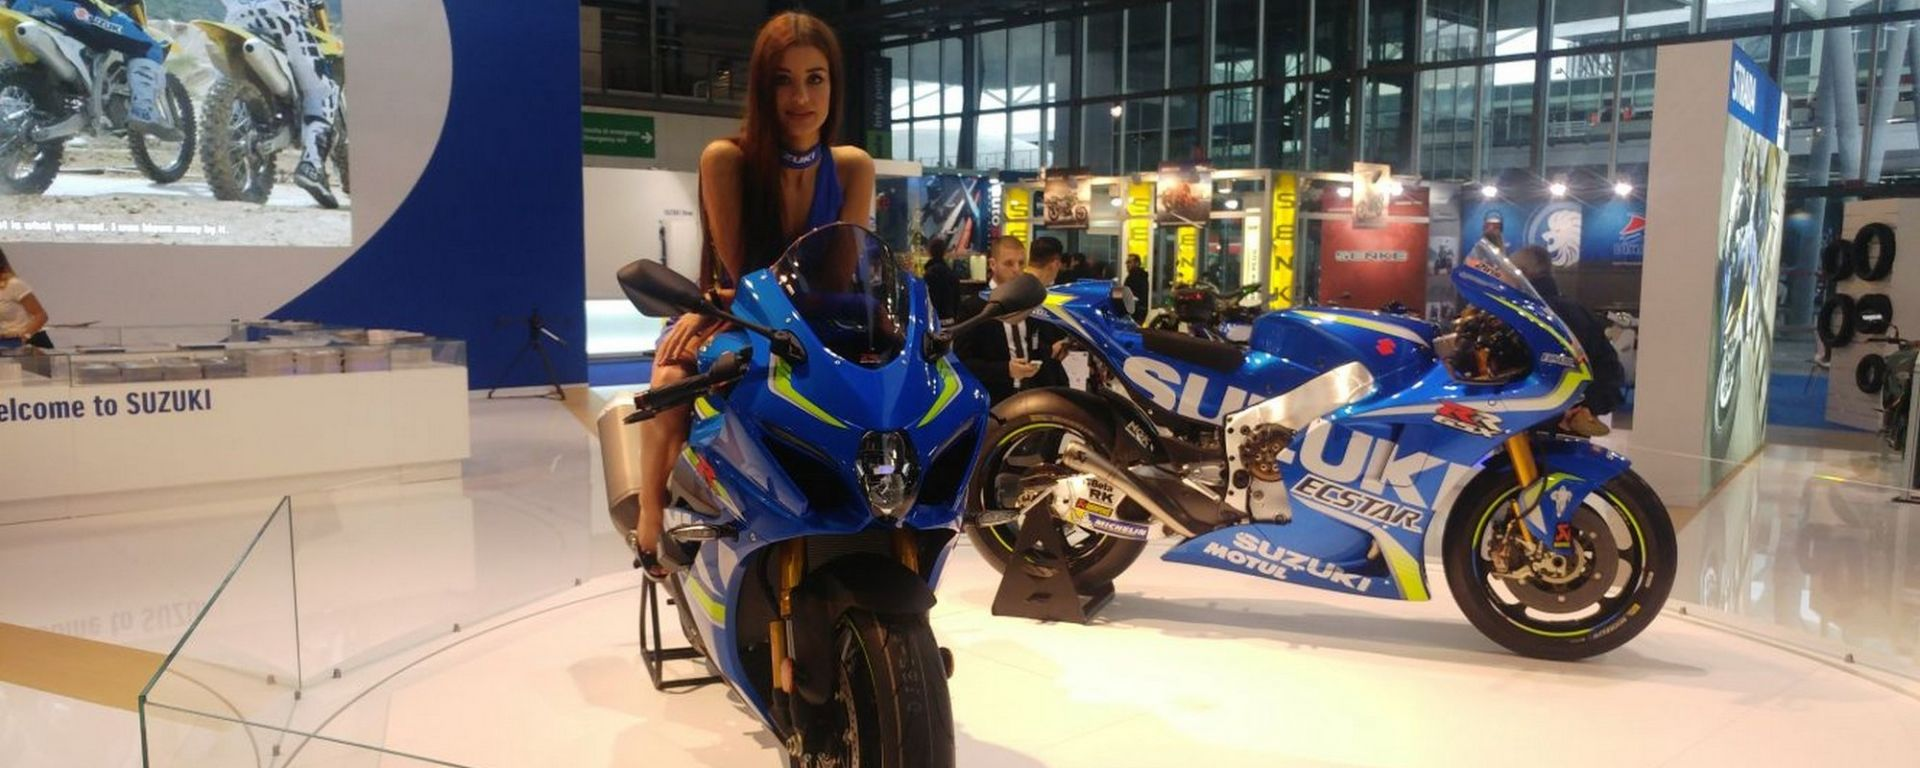 EICMA 2017, lo stand Suzuki